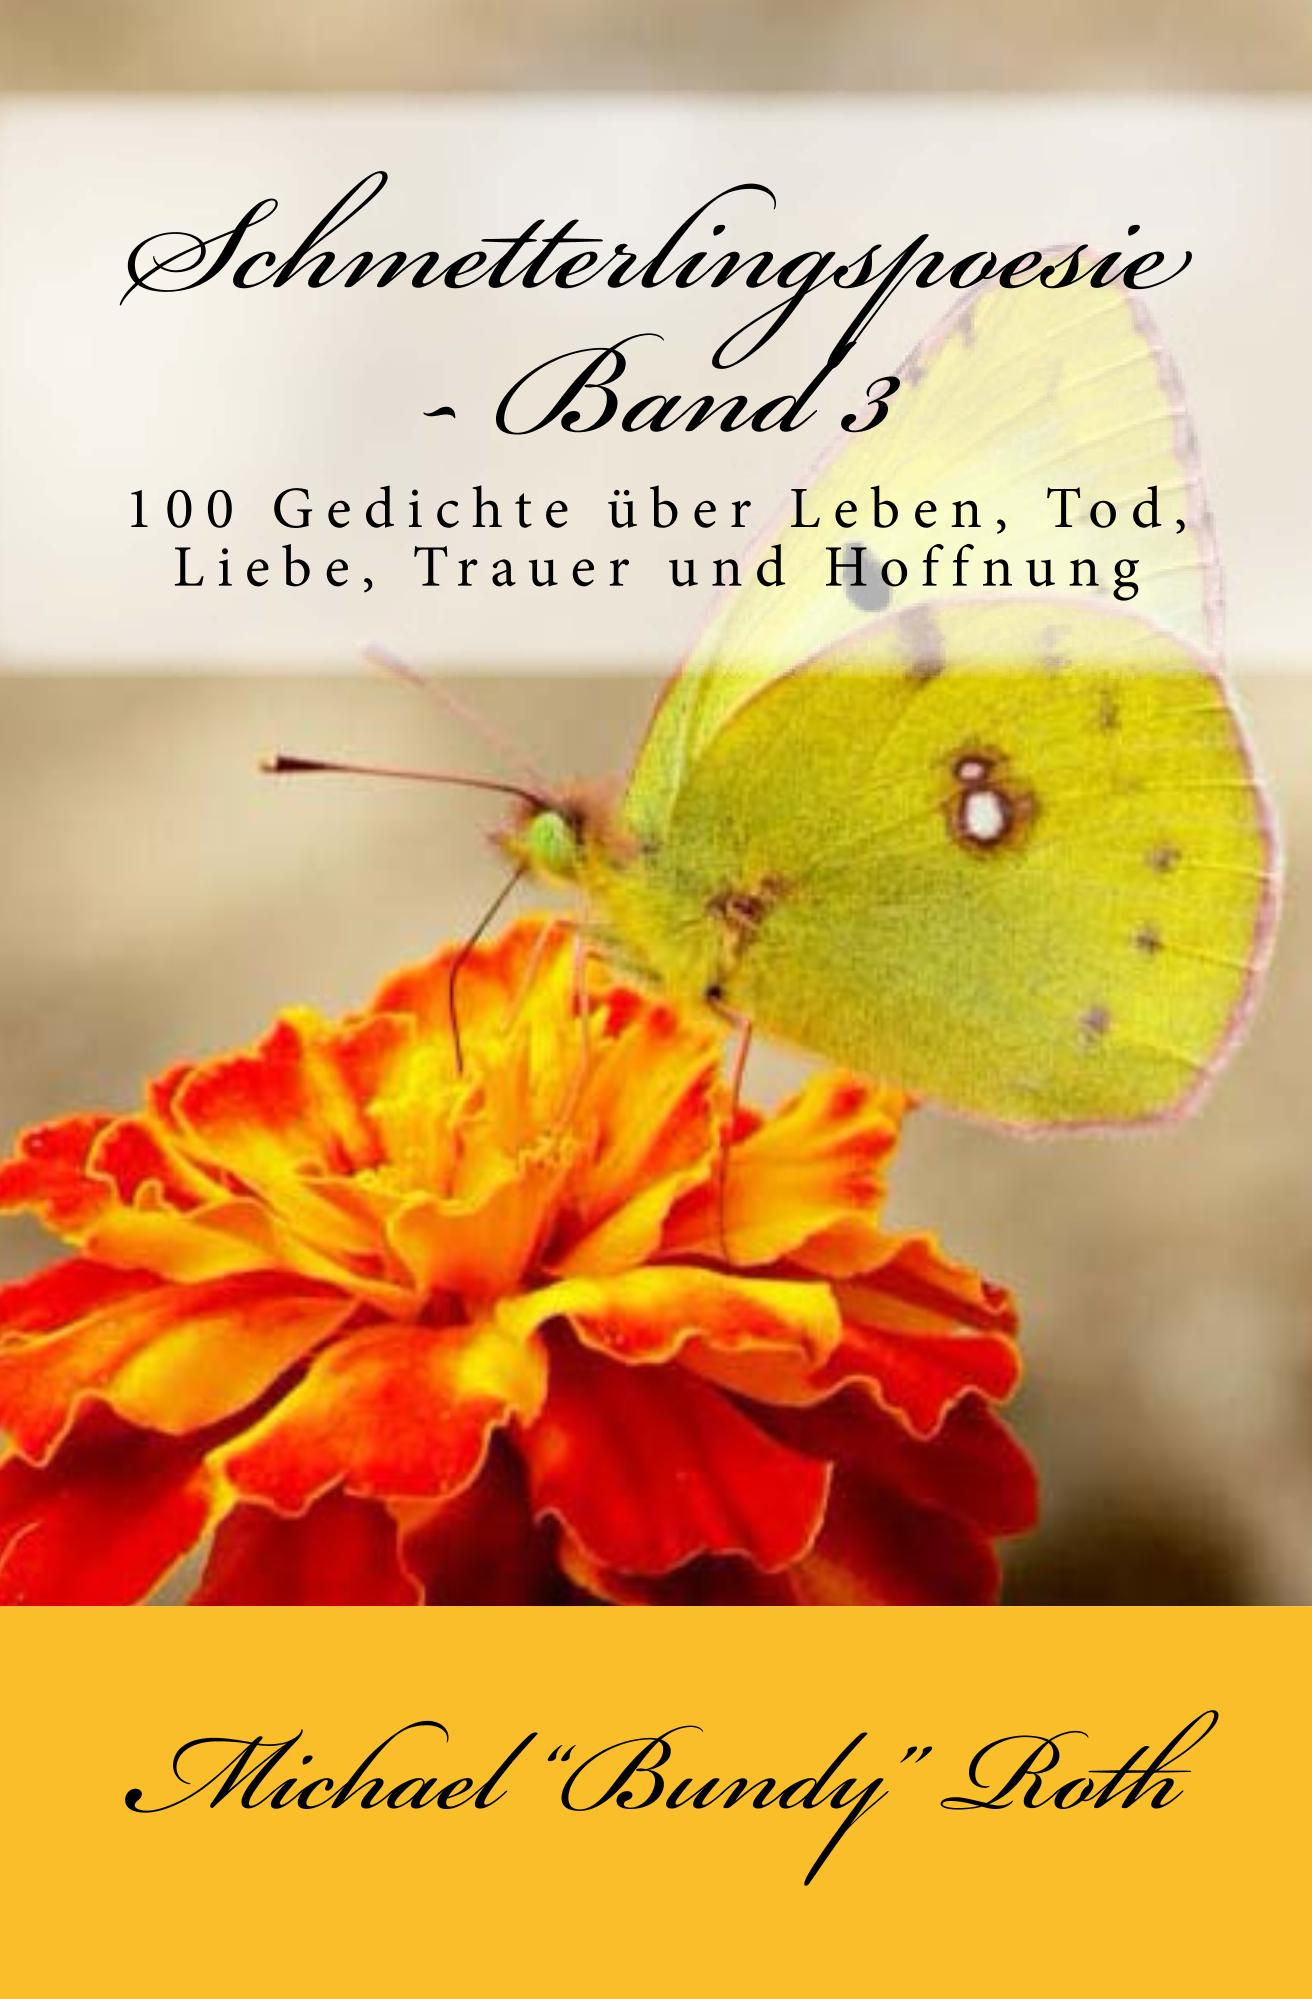 Rezension Schmetterlingspoesie 1 3 Michael Bundy Roth